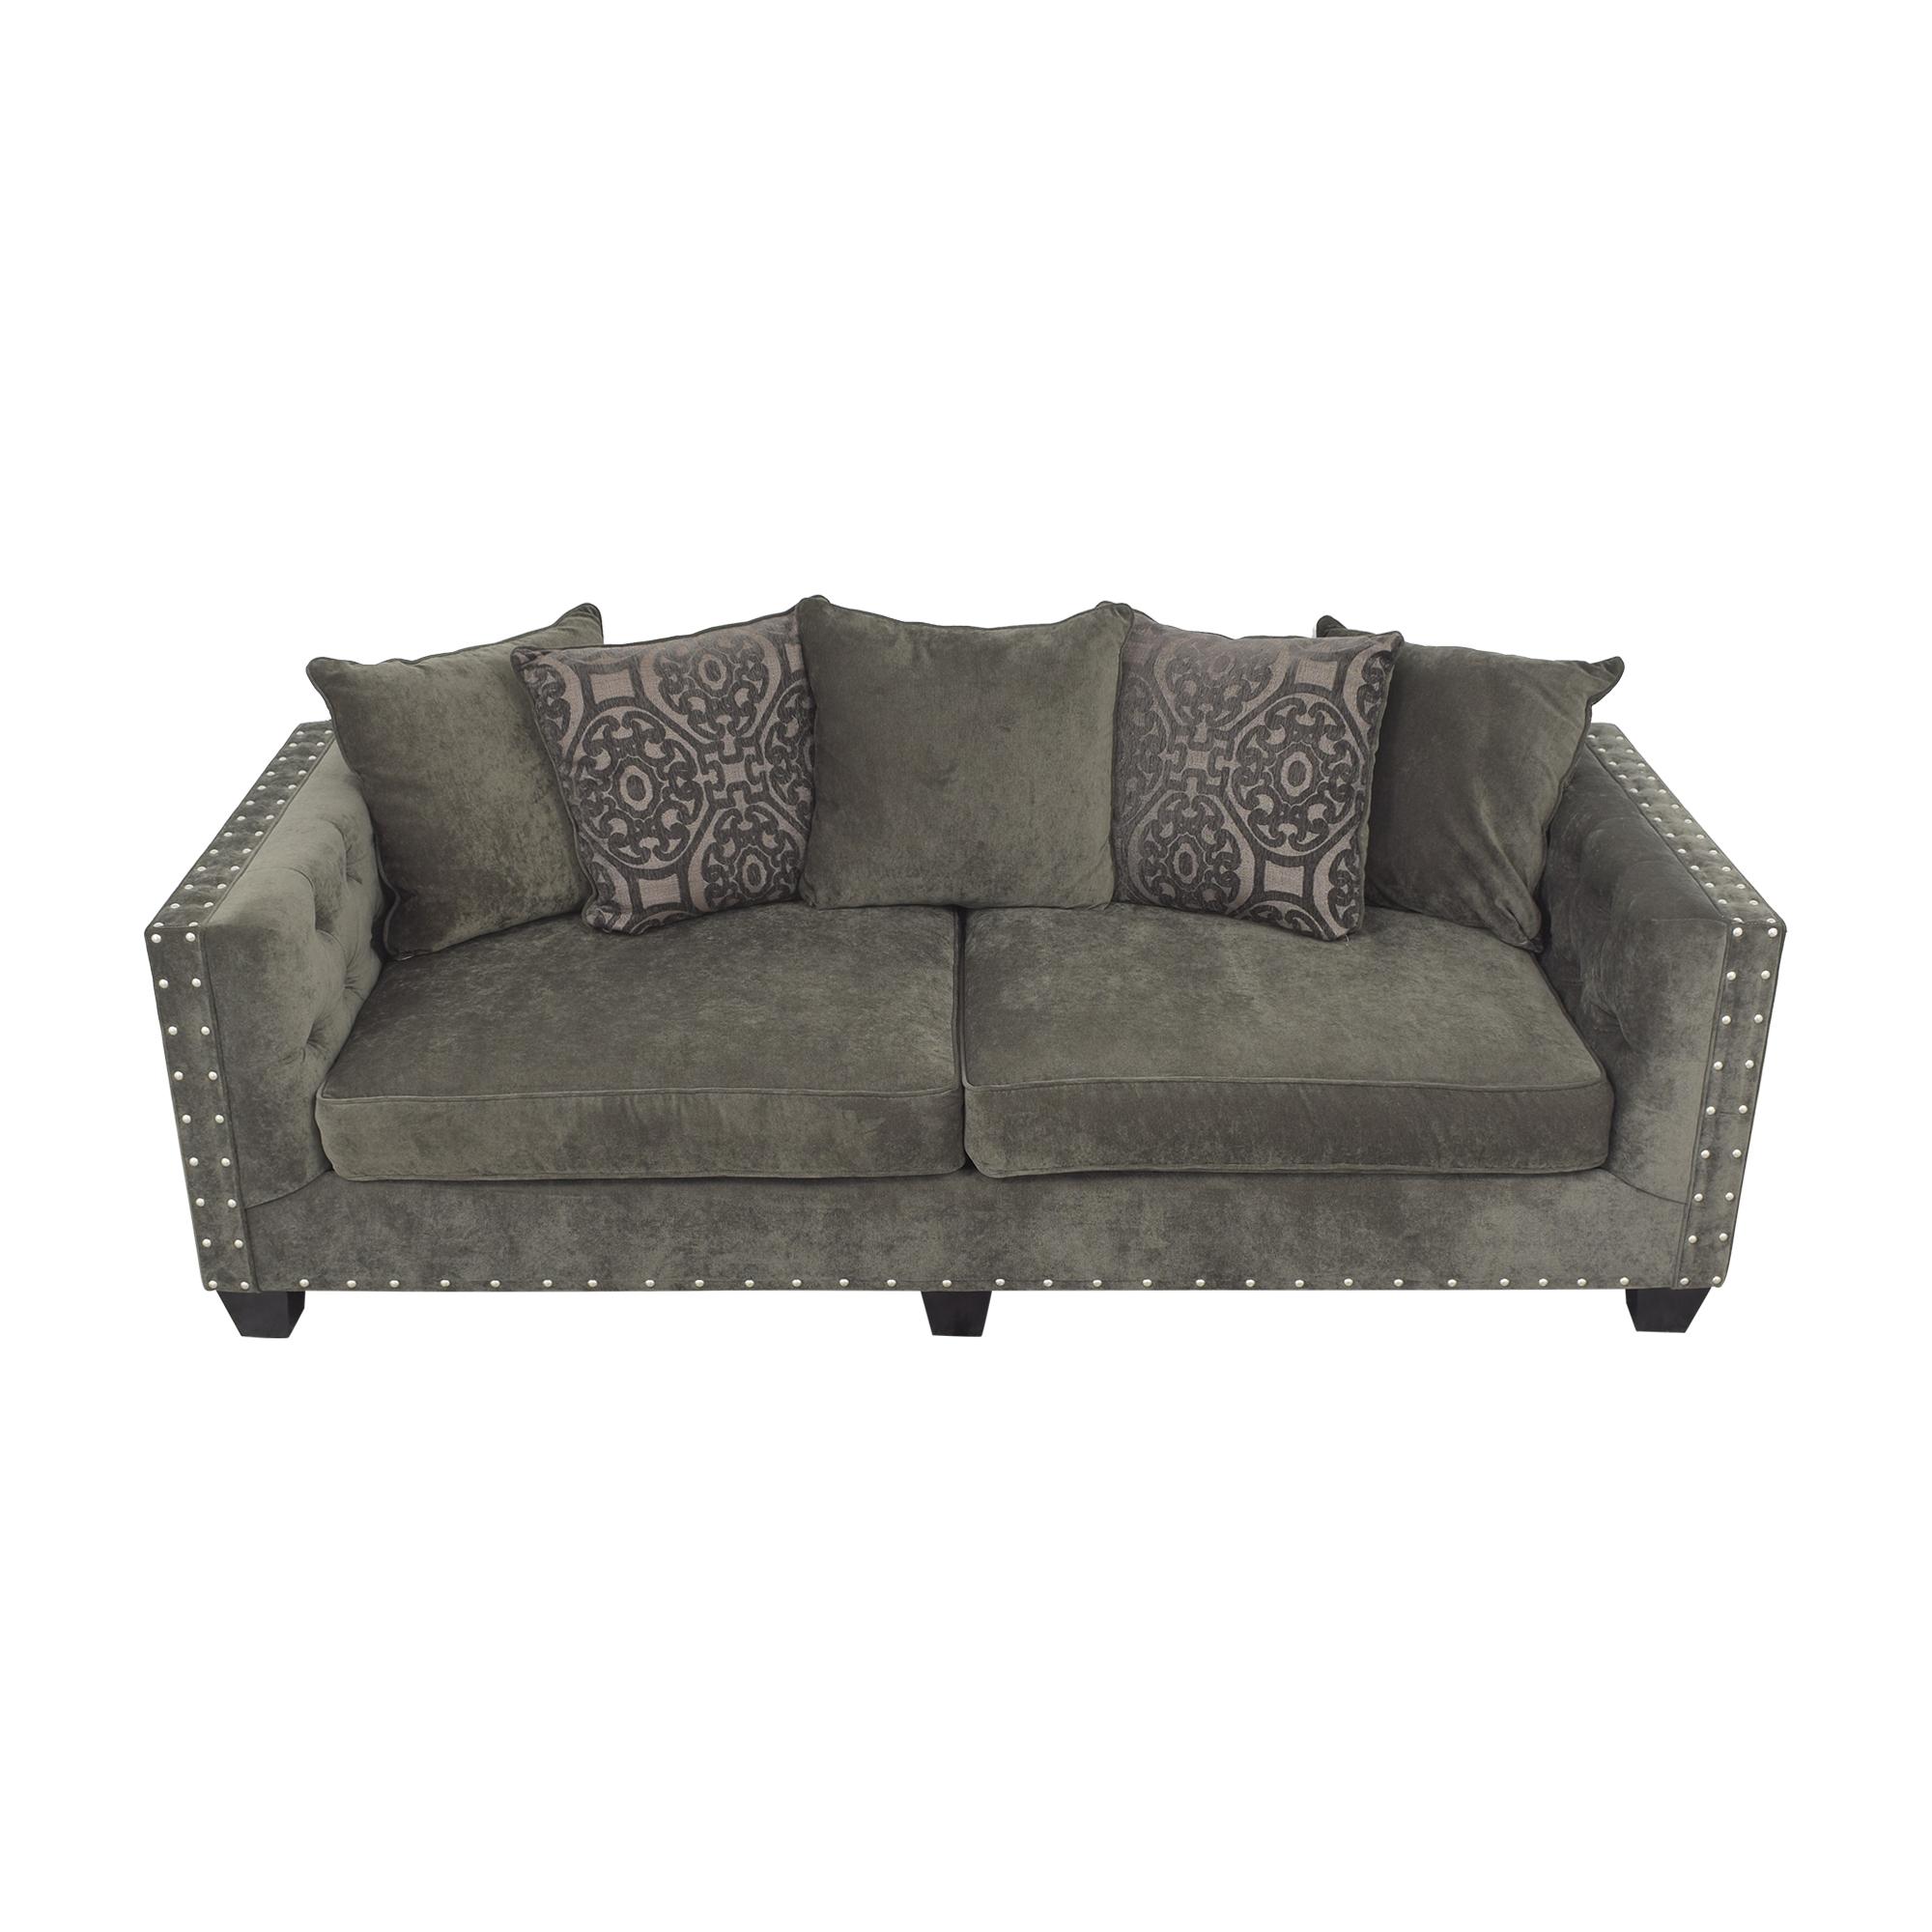 Cindy Crawford Home Cindy Crawford Calista Microfiber Sofa pa